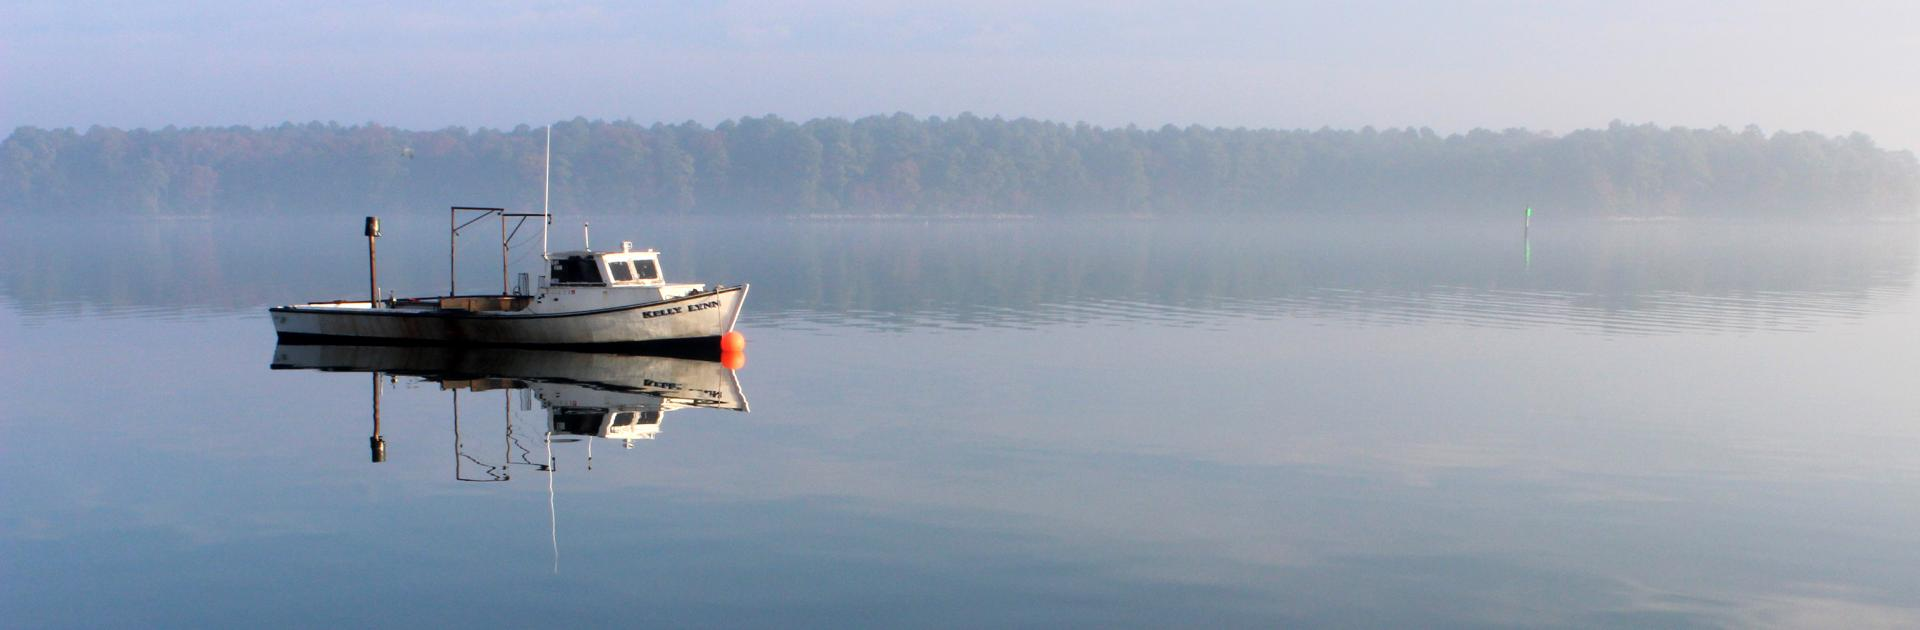 Photo of boat on Chesapeake Bay